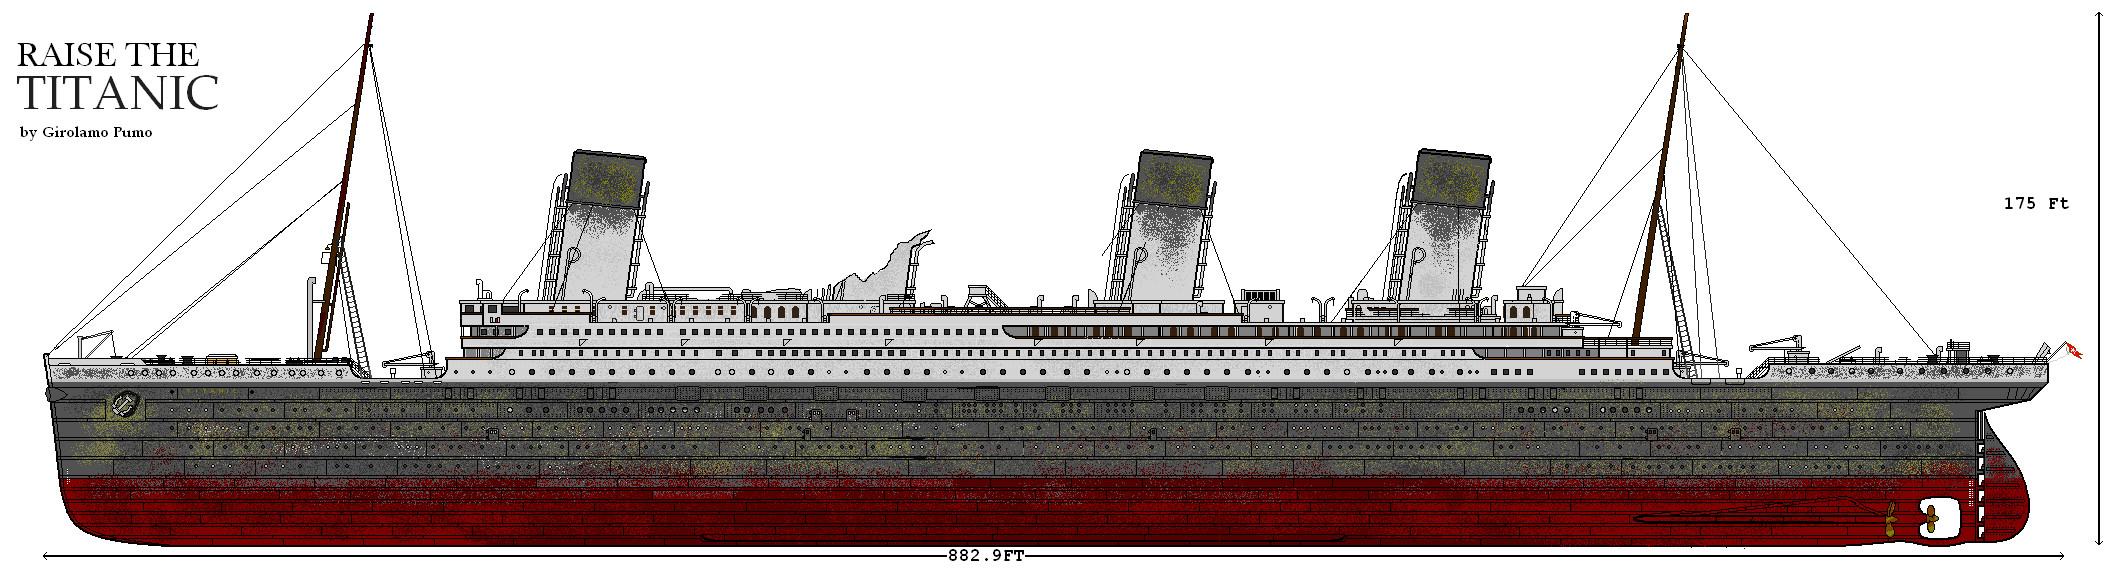 ship 'raise the titanic' by lupin3ITA on DeviantArt Raising The Titanic